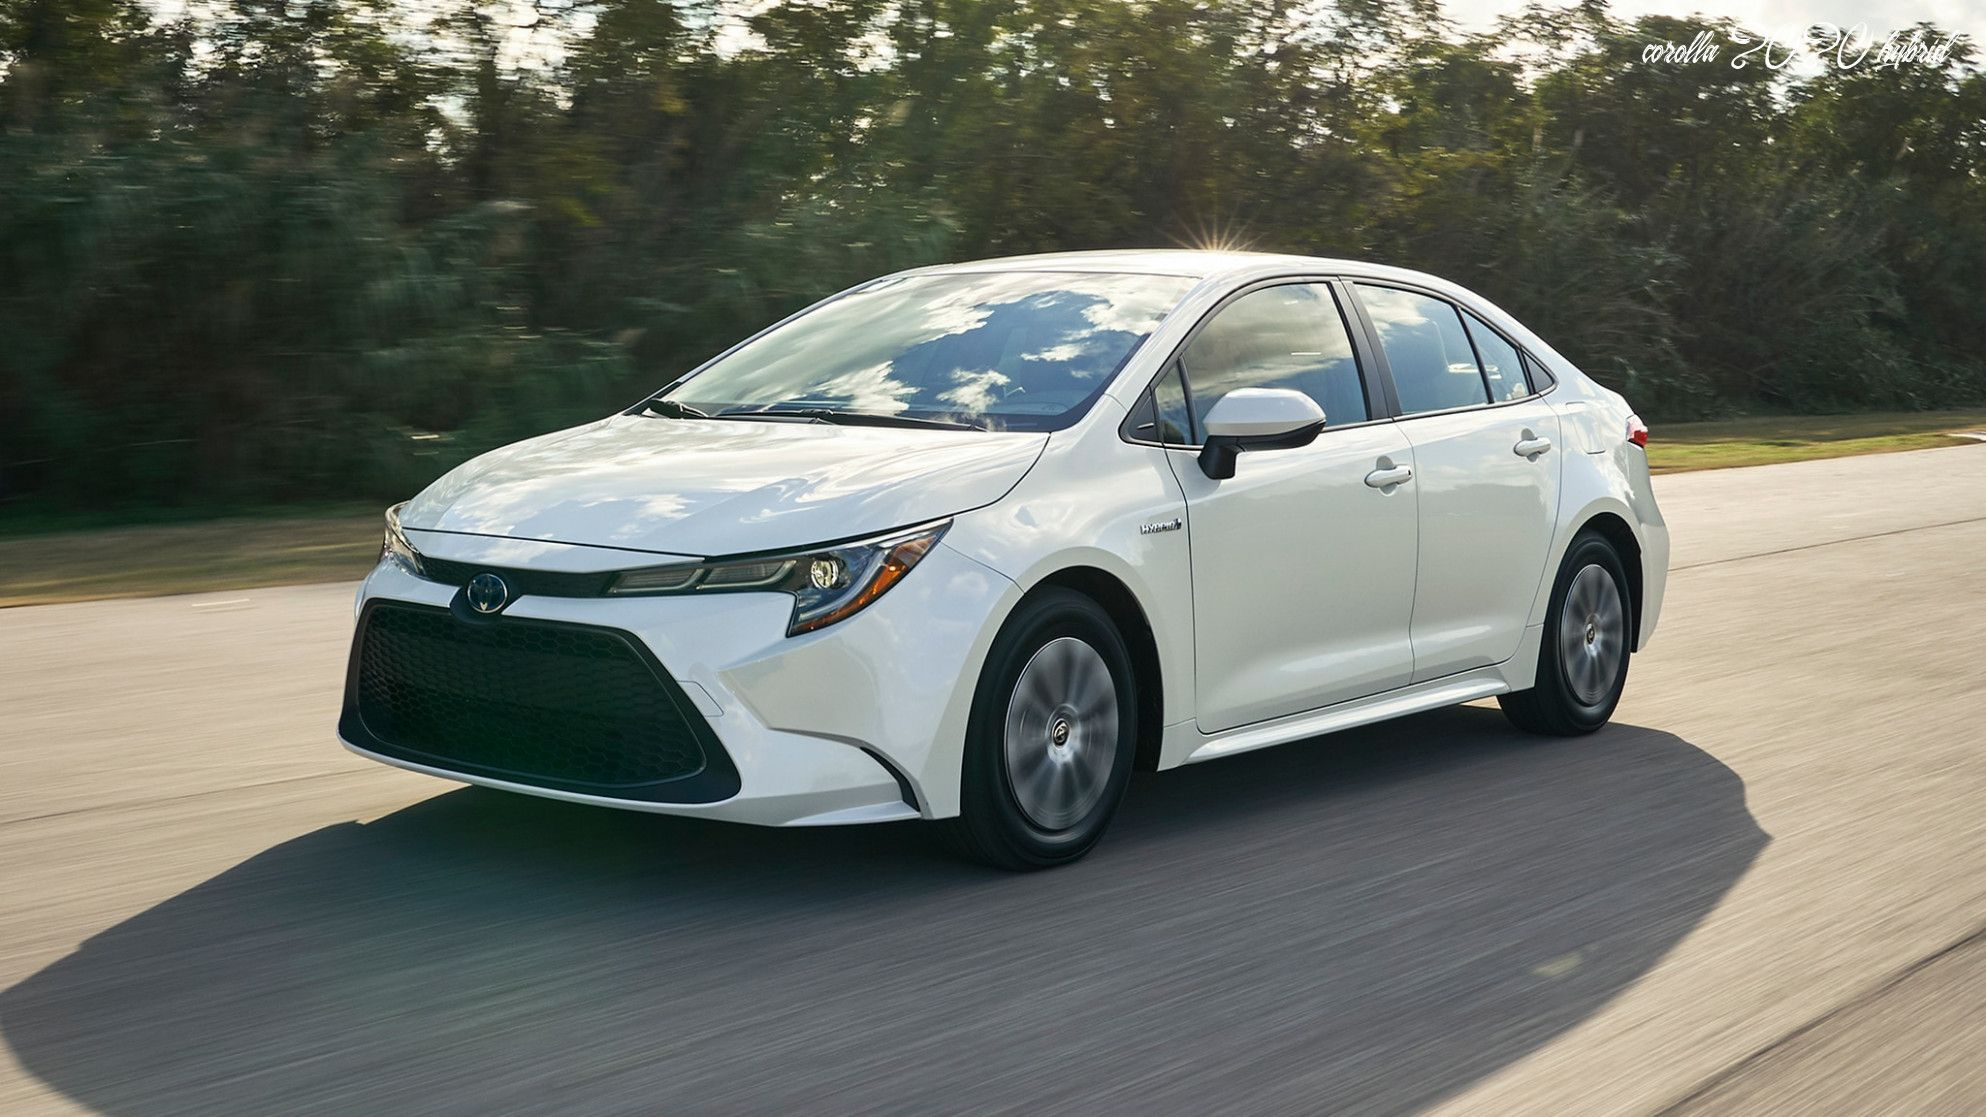 2020 Toyota Corolla Hybrid Le Toyota Corolla Toyota Corolla